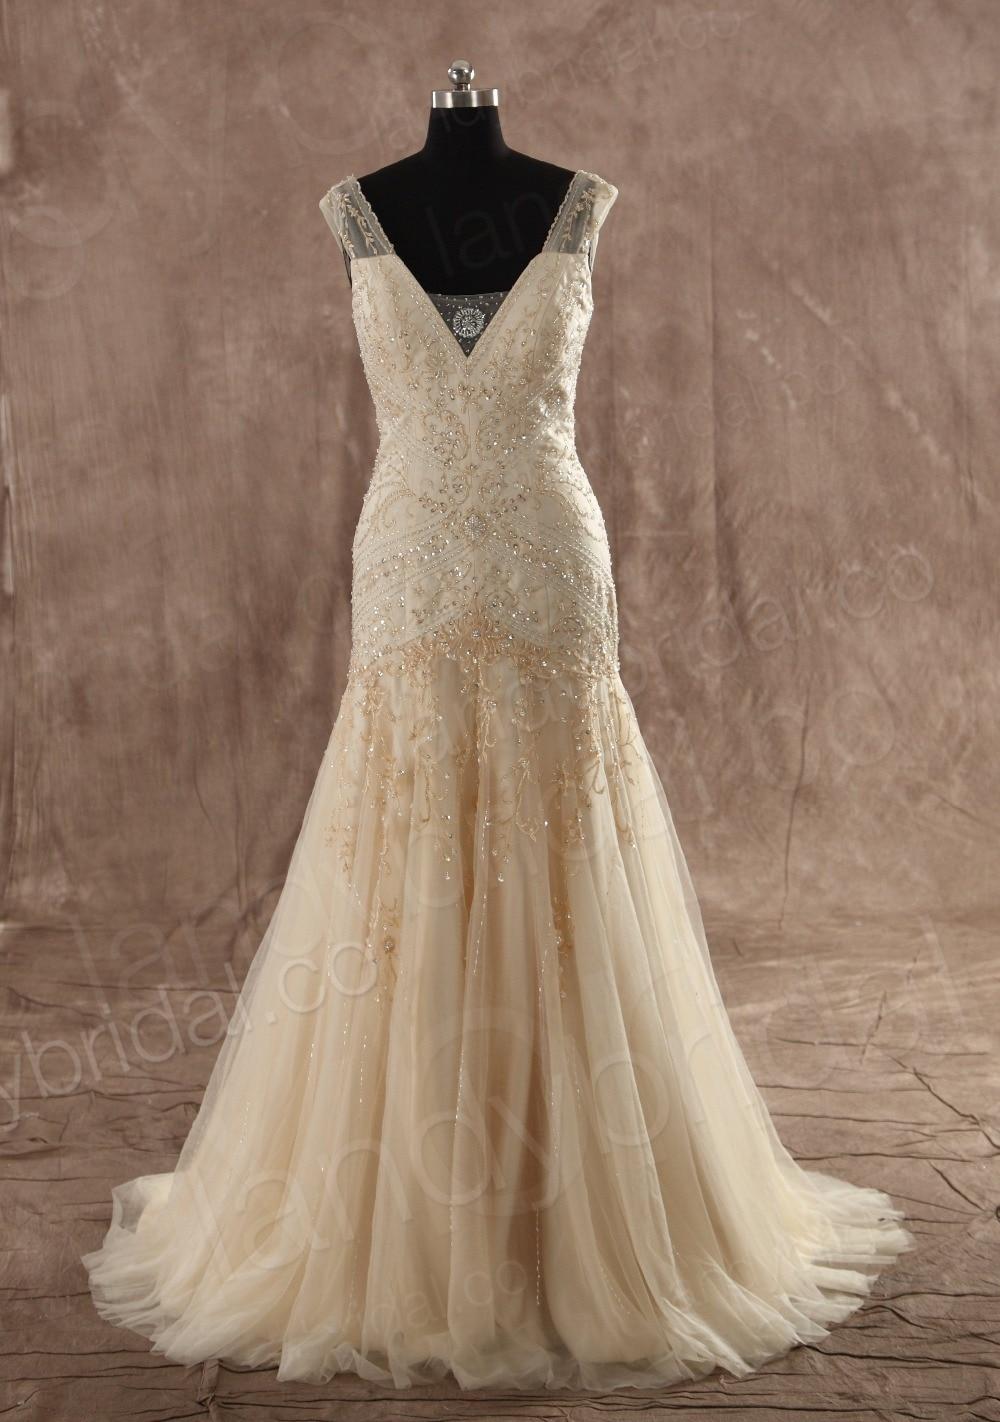 Chocolate wedding dress